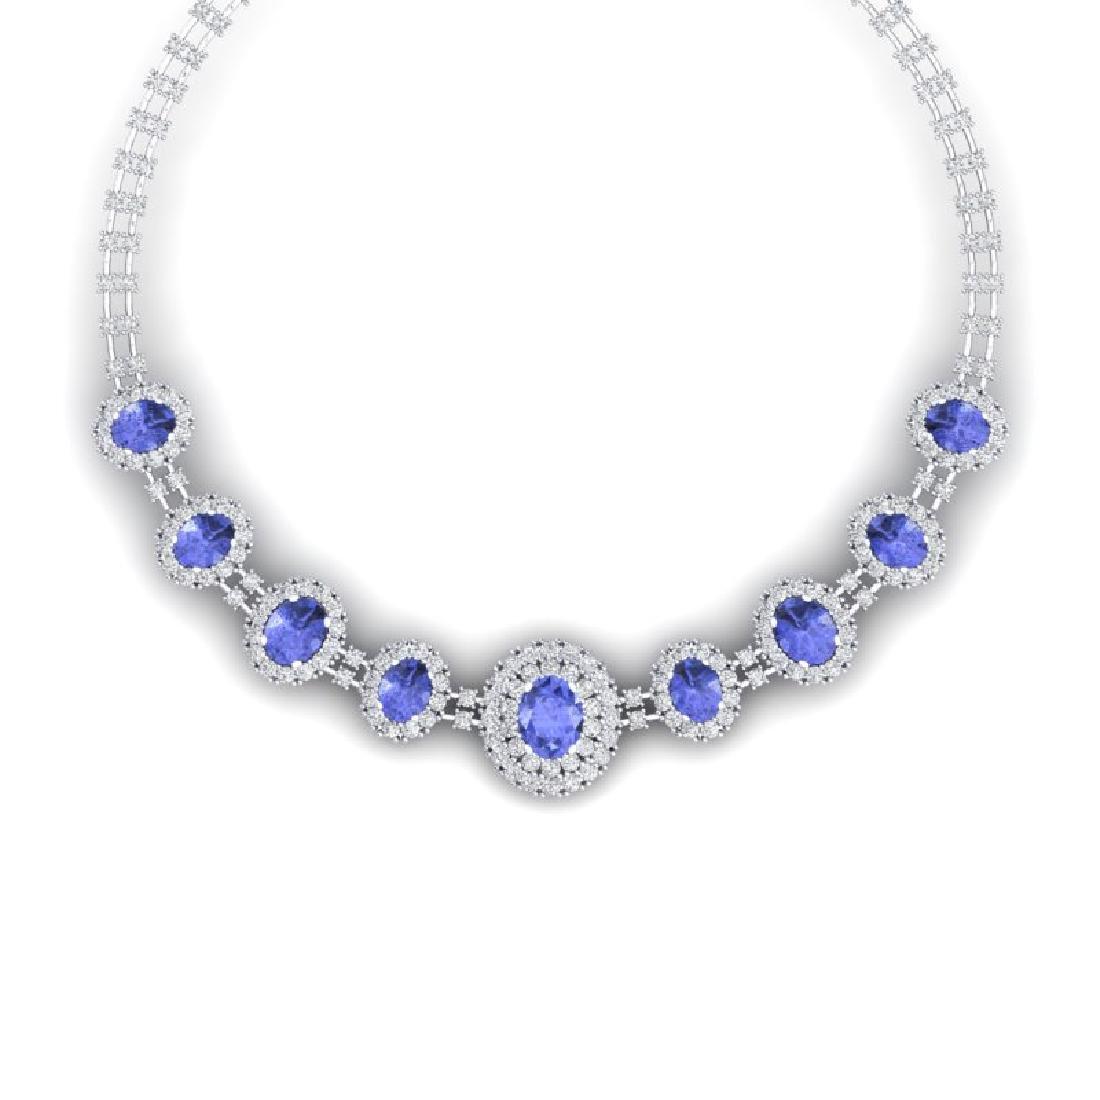 46.51 CTW Royalty Tanzanite & VS Diamond Necklace 18K